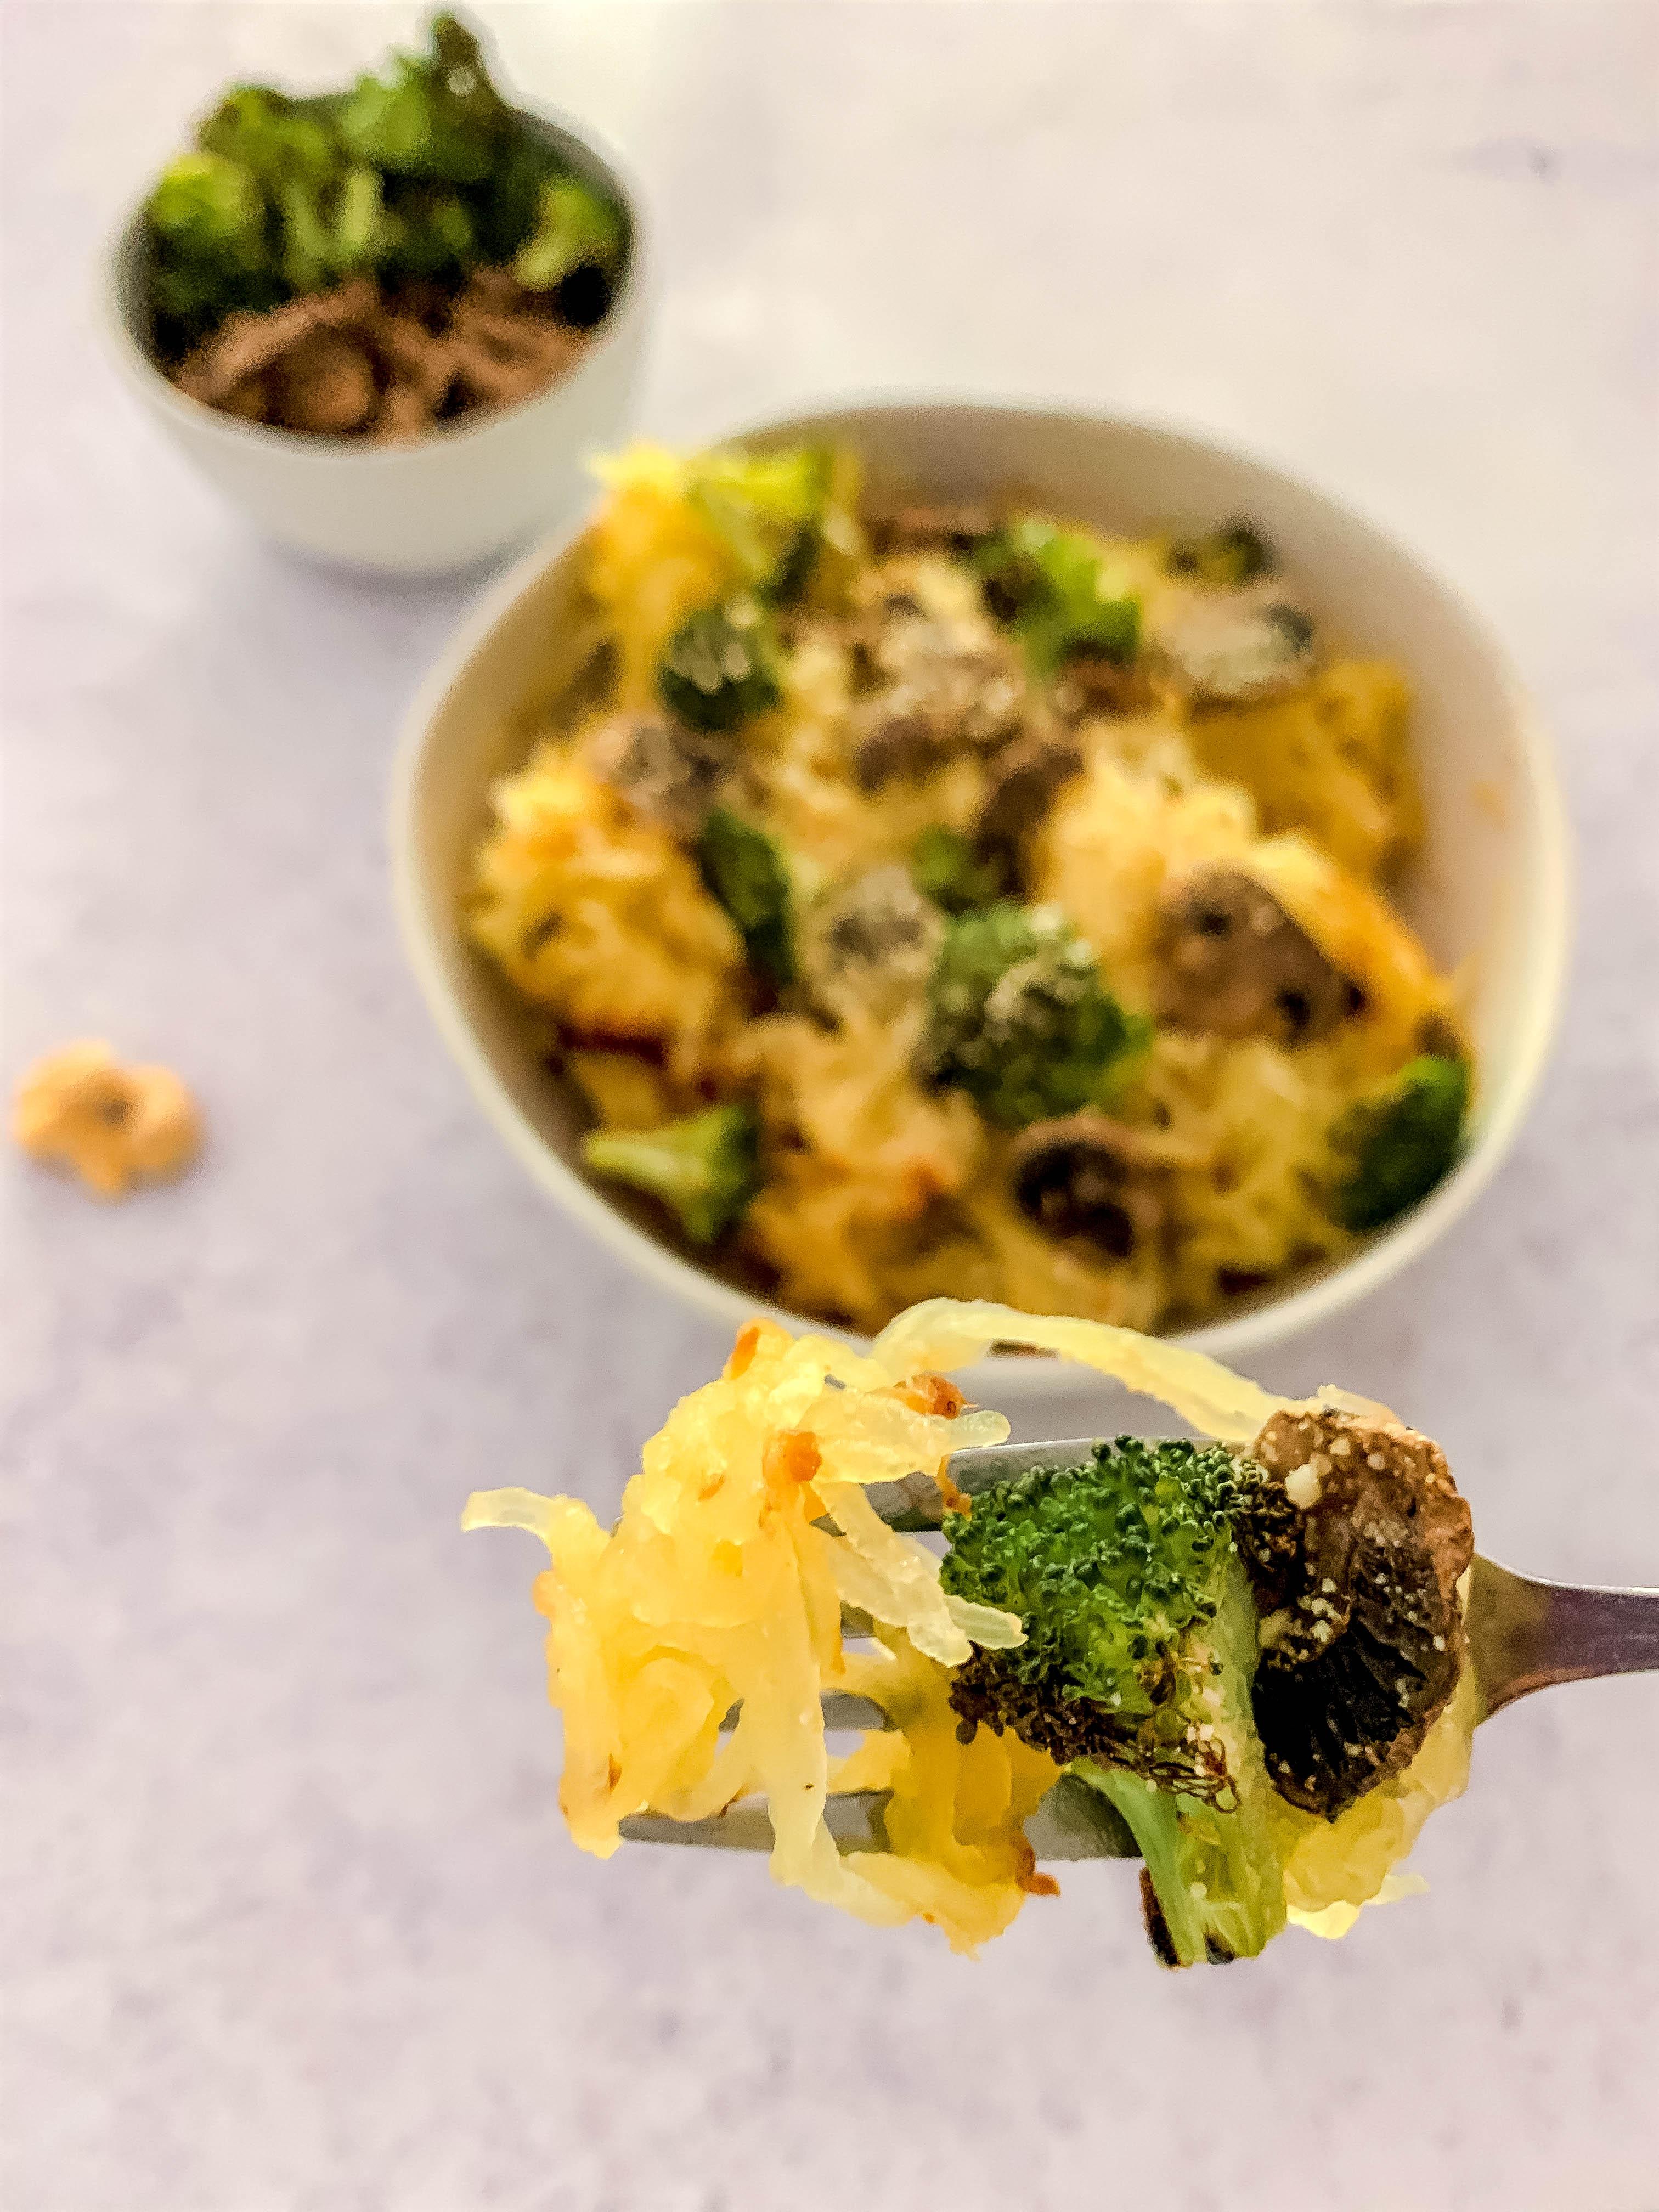 Plant-Based Broccoli Parmesan Spaghetti Squash